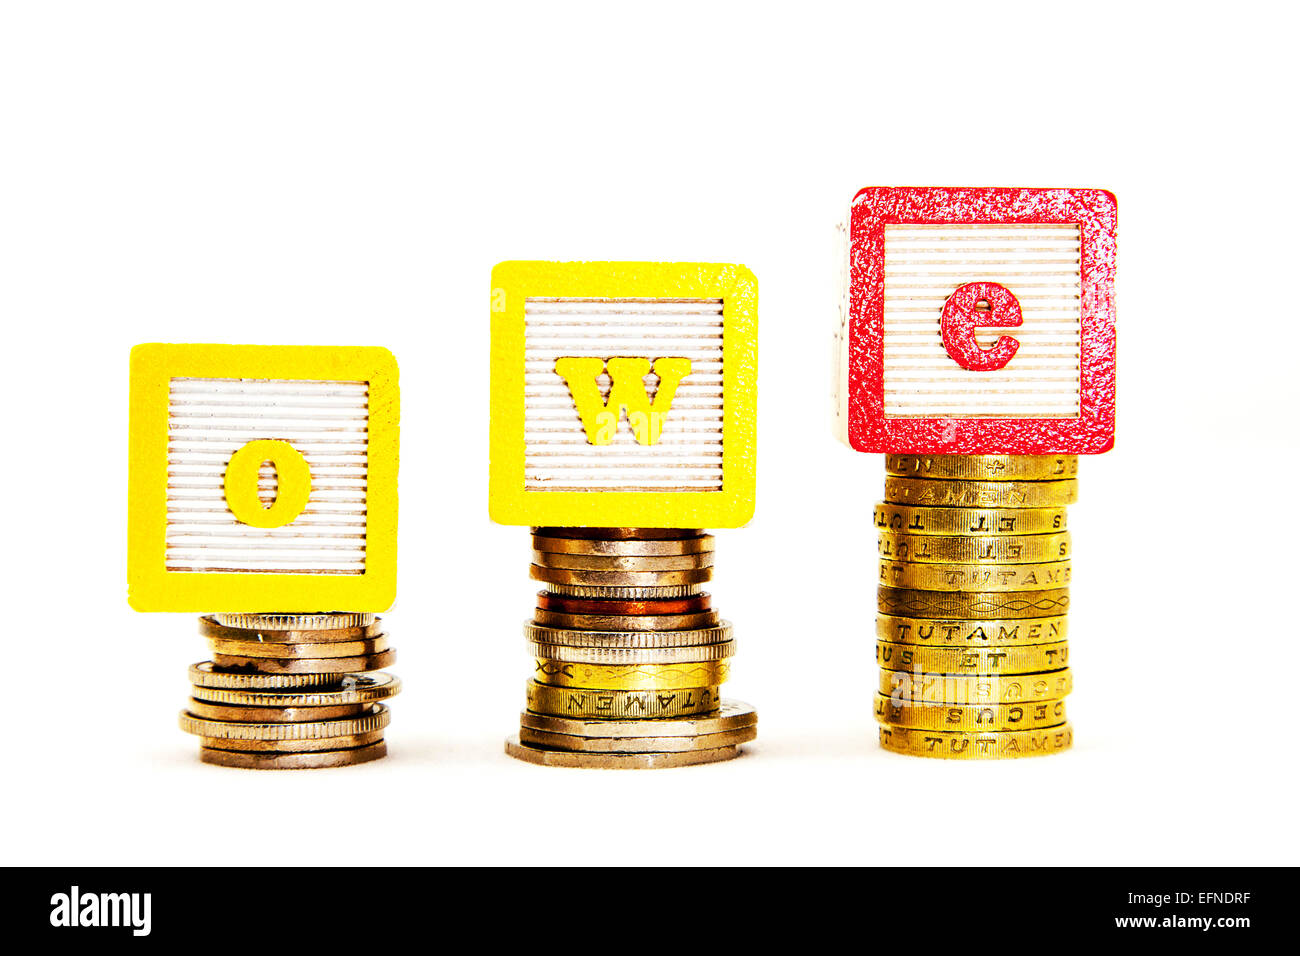 owe money debt debts loan loans credit lender lent payback more interest rate pound pounds cut out copy space white - Stock Image